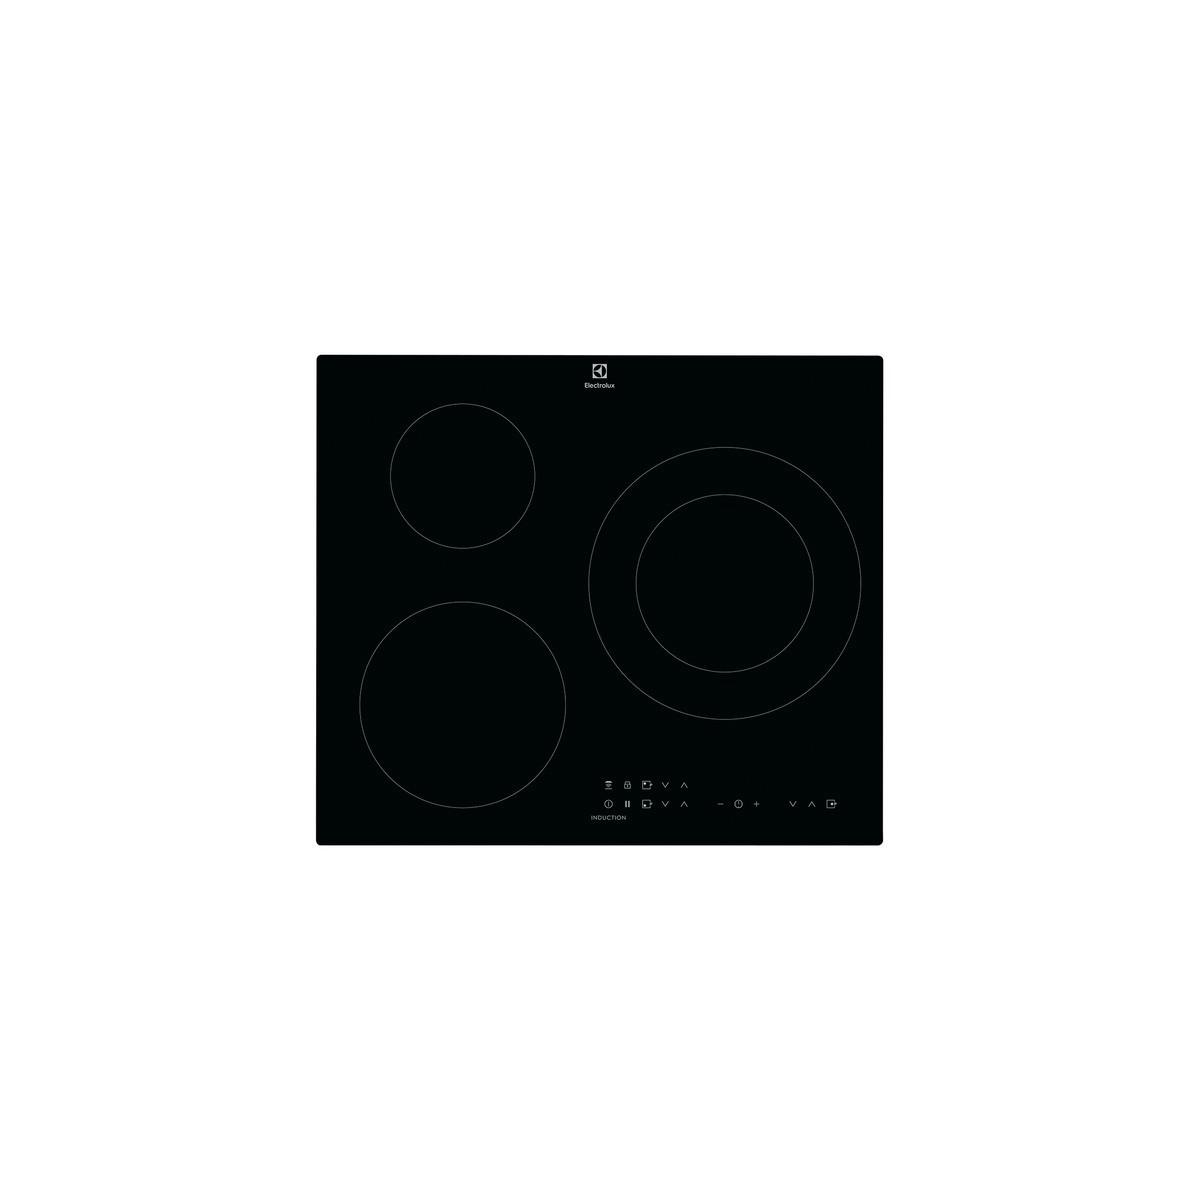 Vitroceramica induccion Electrolux LIT60336 59cm